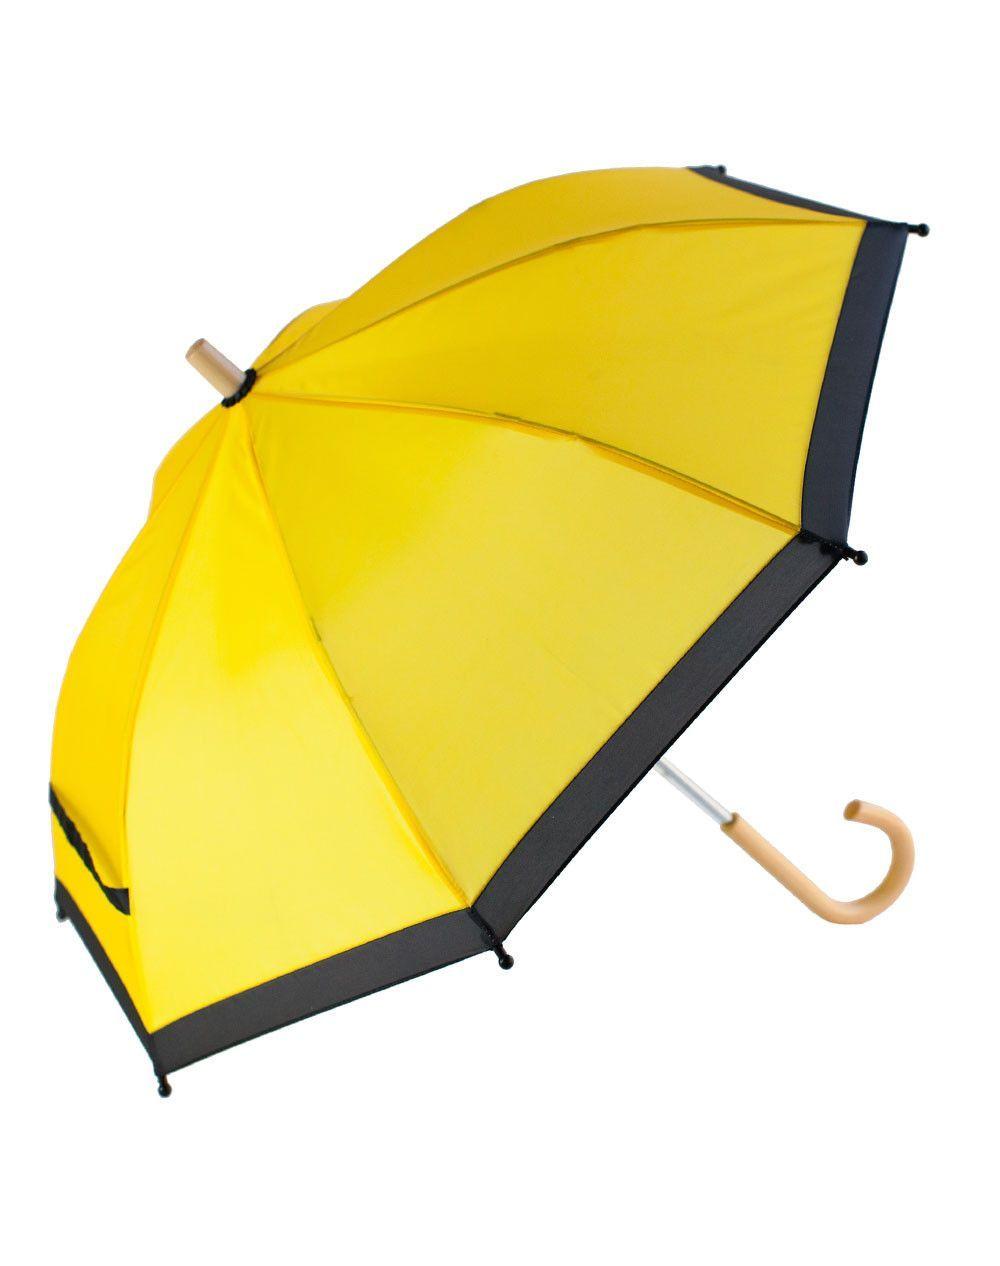 a7c88b0bac Children's Umbrella Yellow | Umbrella | Childrens umbrellas, Kids ...